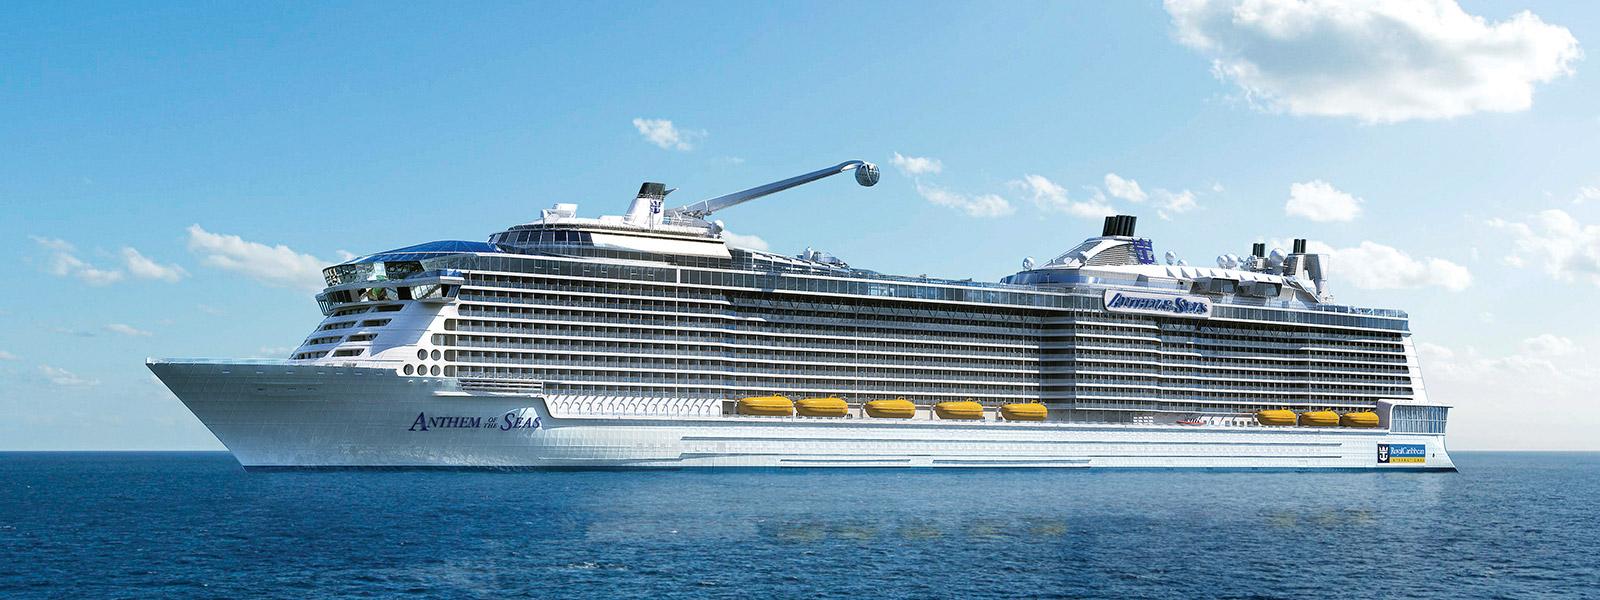 Anthem Of The Seas Cruise Ship Lisbon 2015 Lisbon